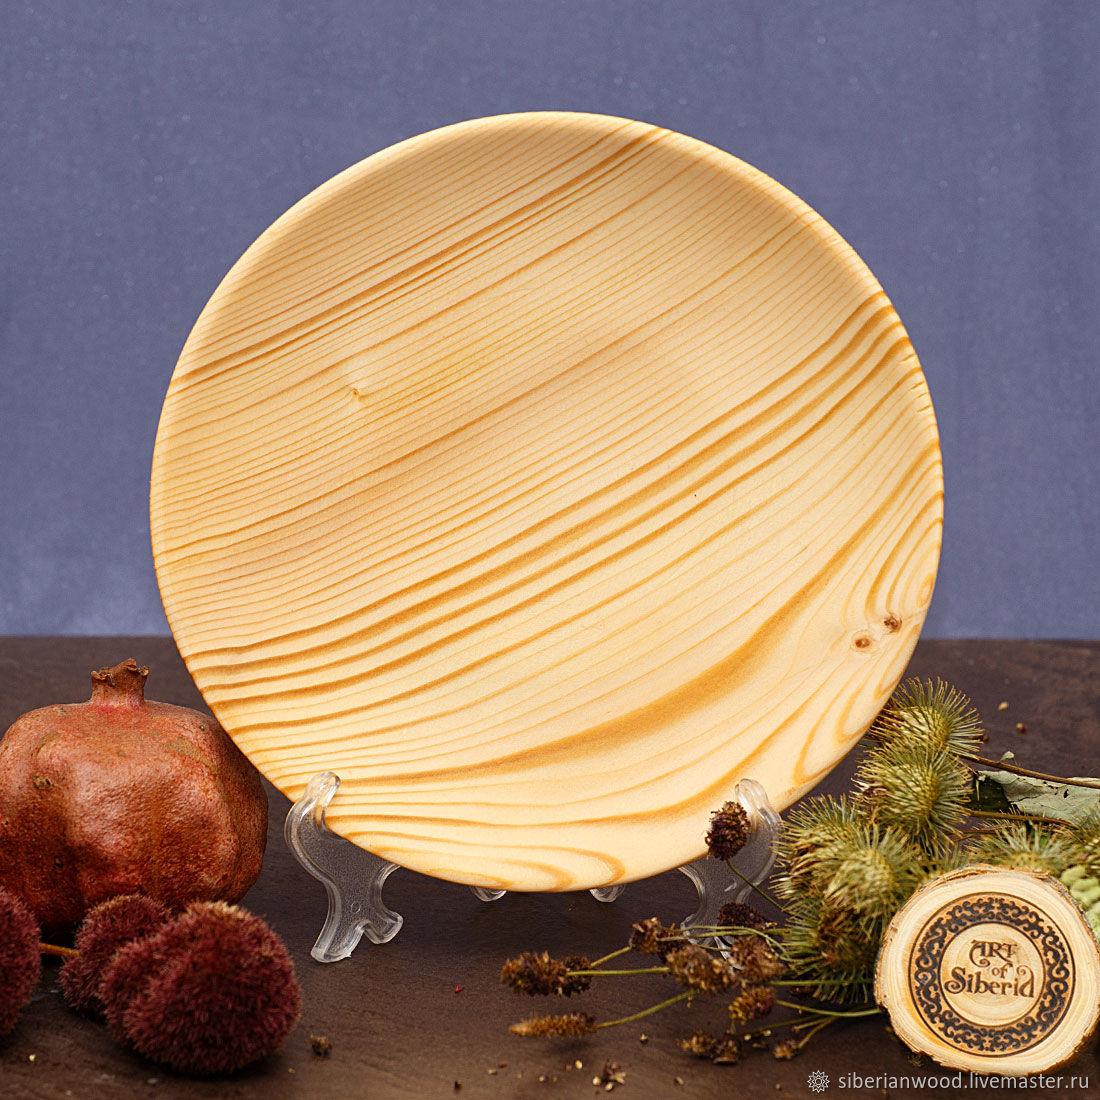 Wooden Plate 20.5 cm 100%#62, Plates, Novokuznetsk,  Фото №1